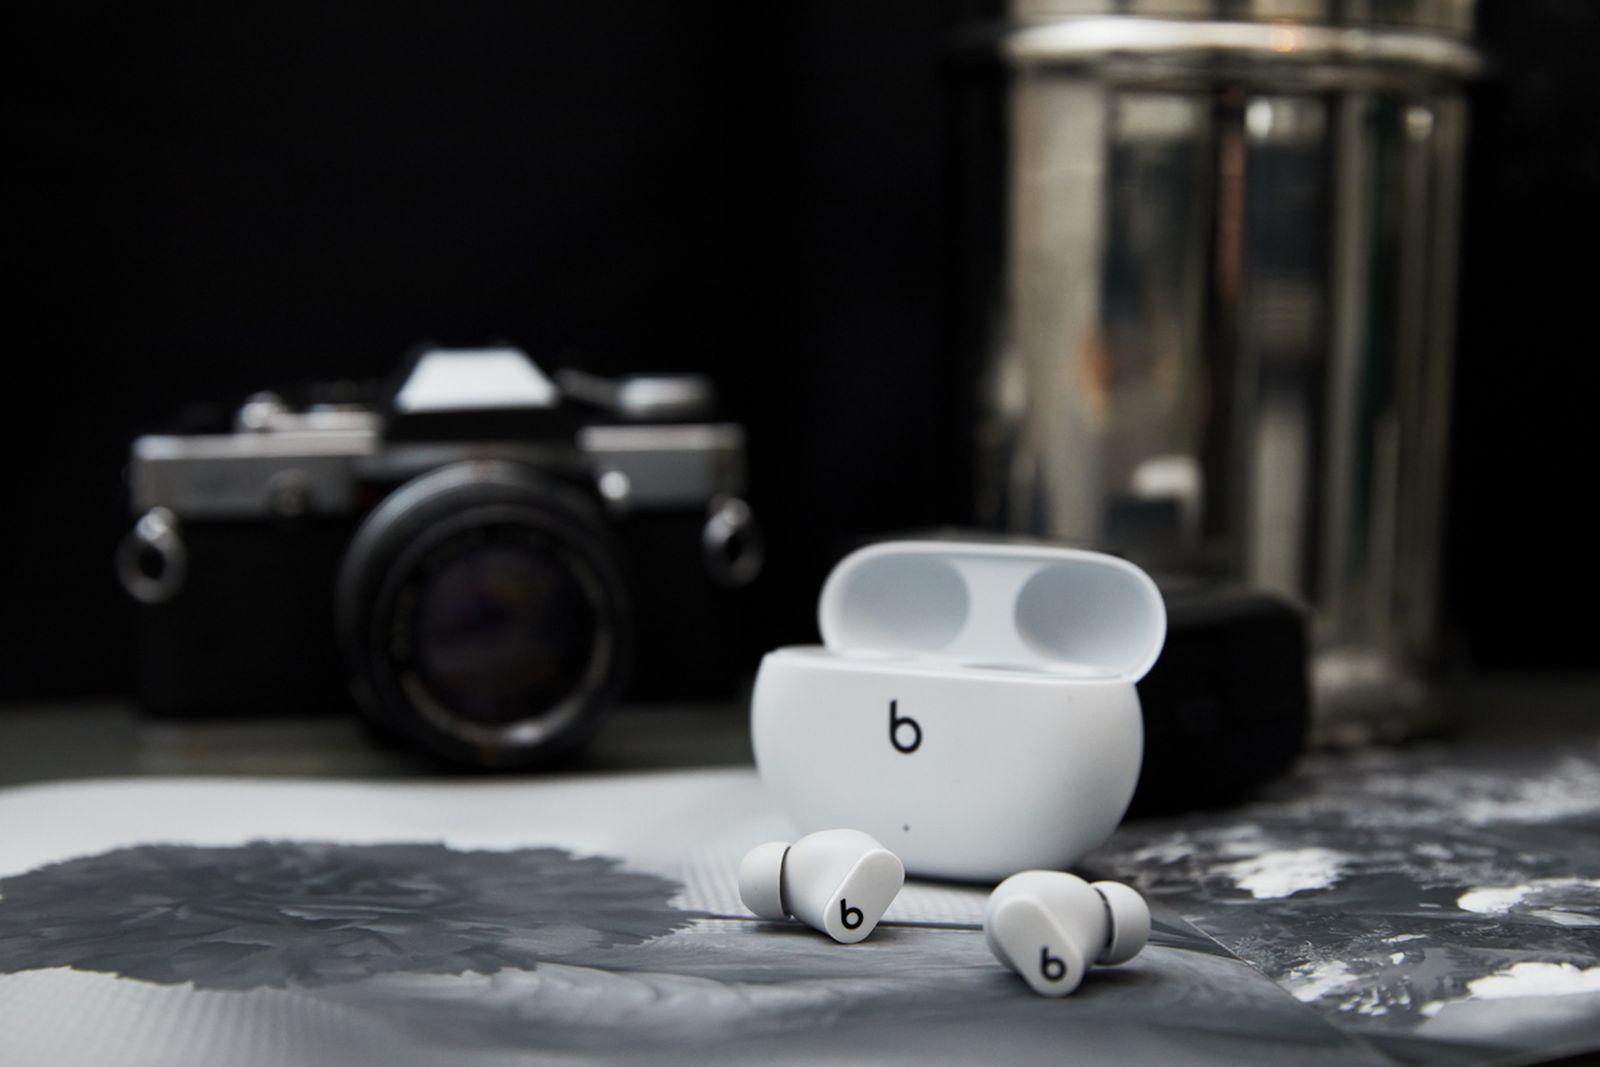 apple-beats-studio-buds- (12)